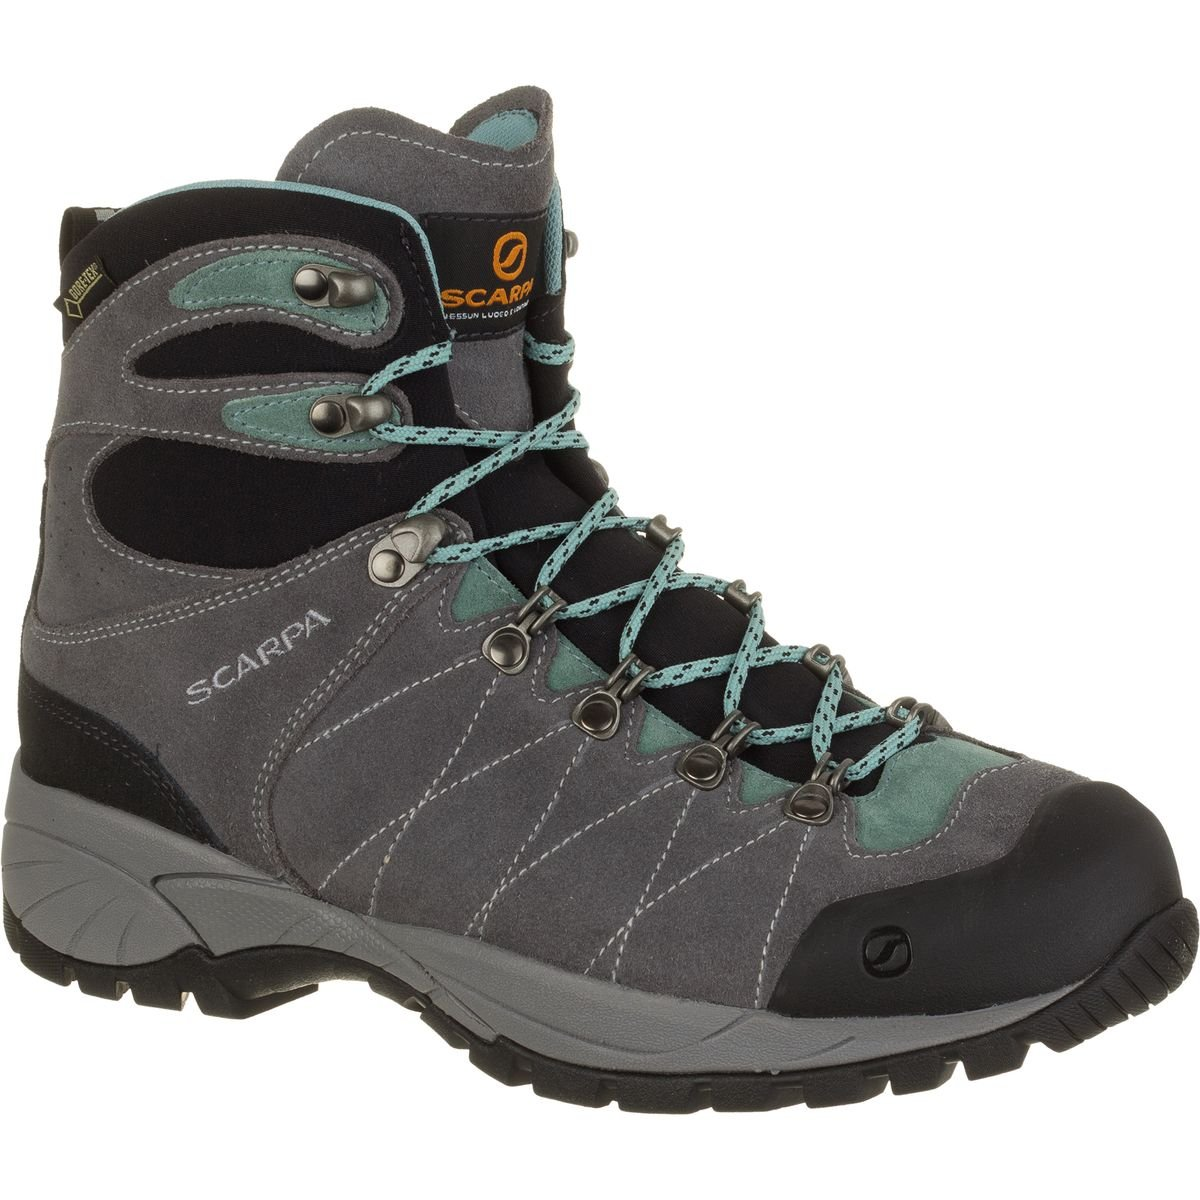 SCARPA Women's R-Evolution GTX Wmn Hiking Boot, Smoke/Jade, 37 EU/6 M US